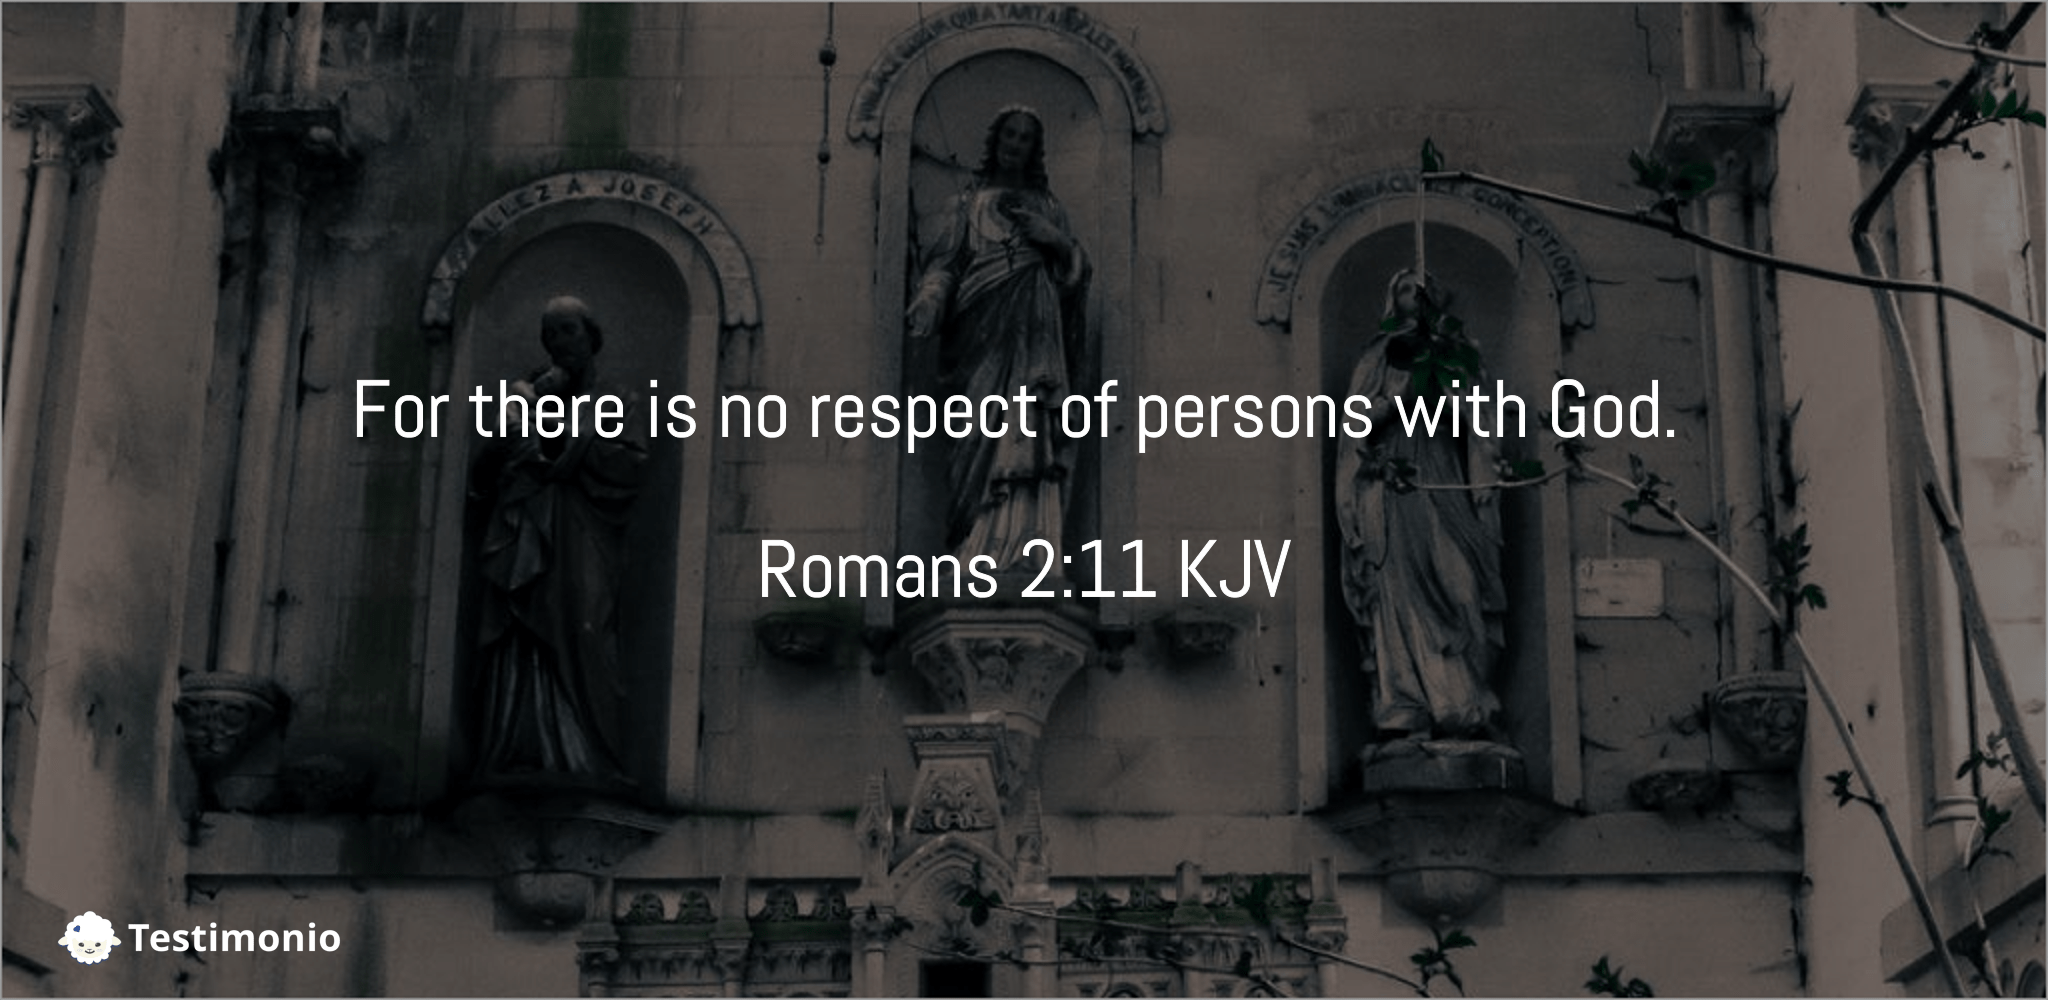 Romans 2:11